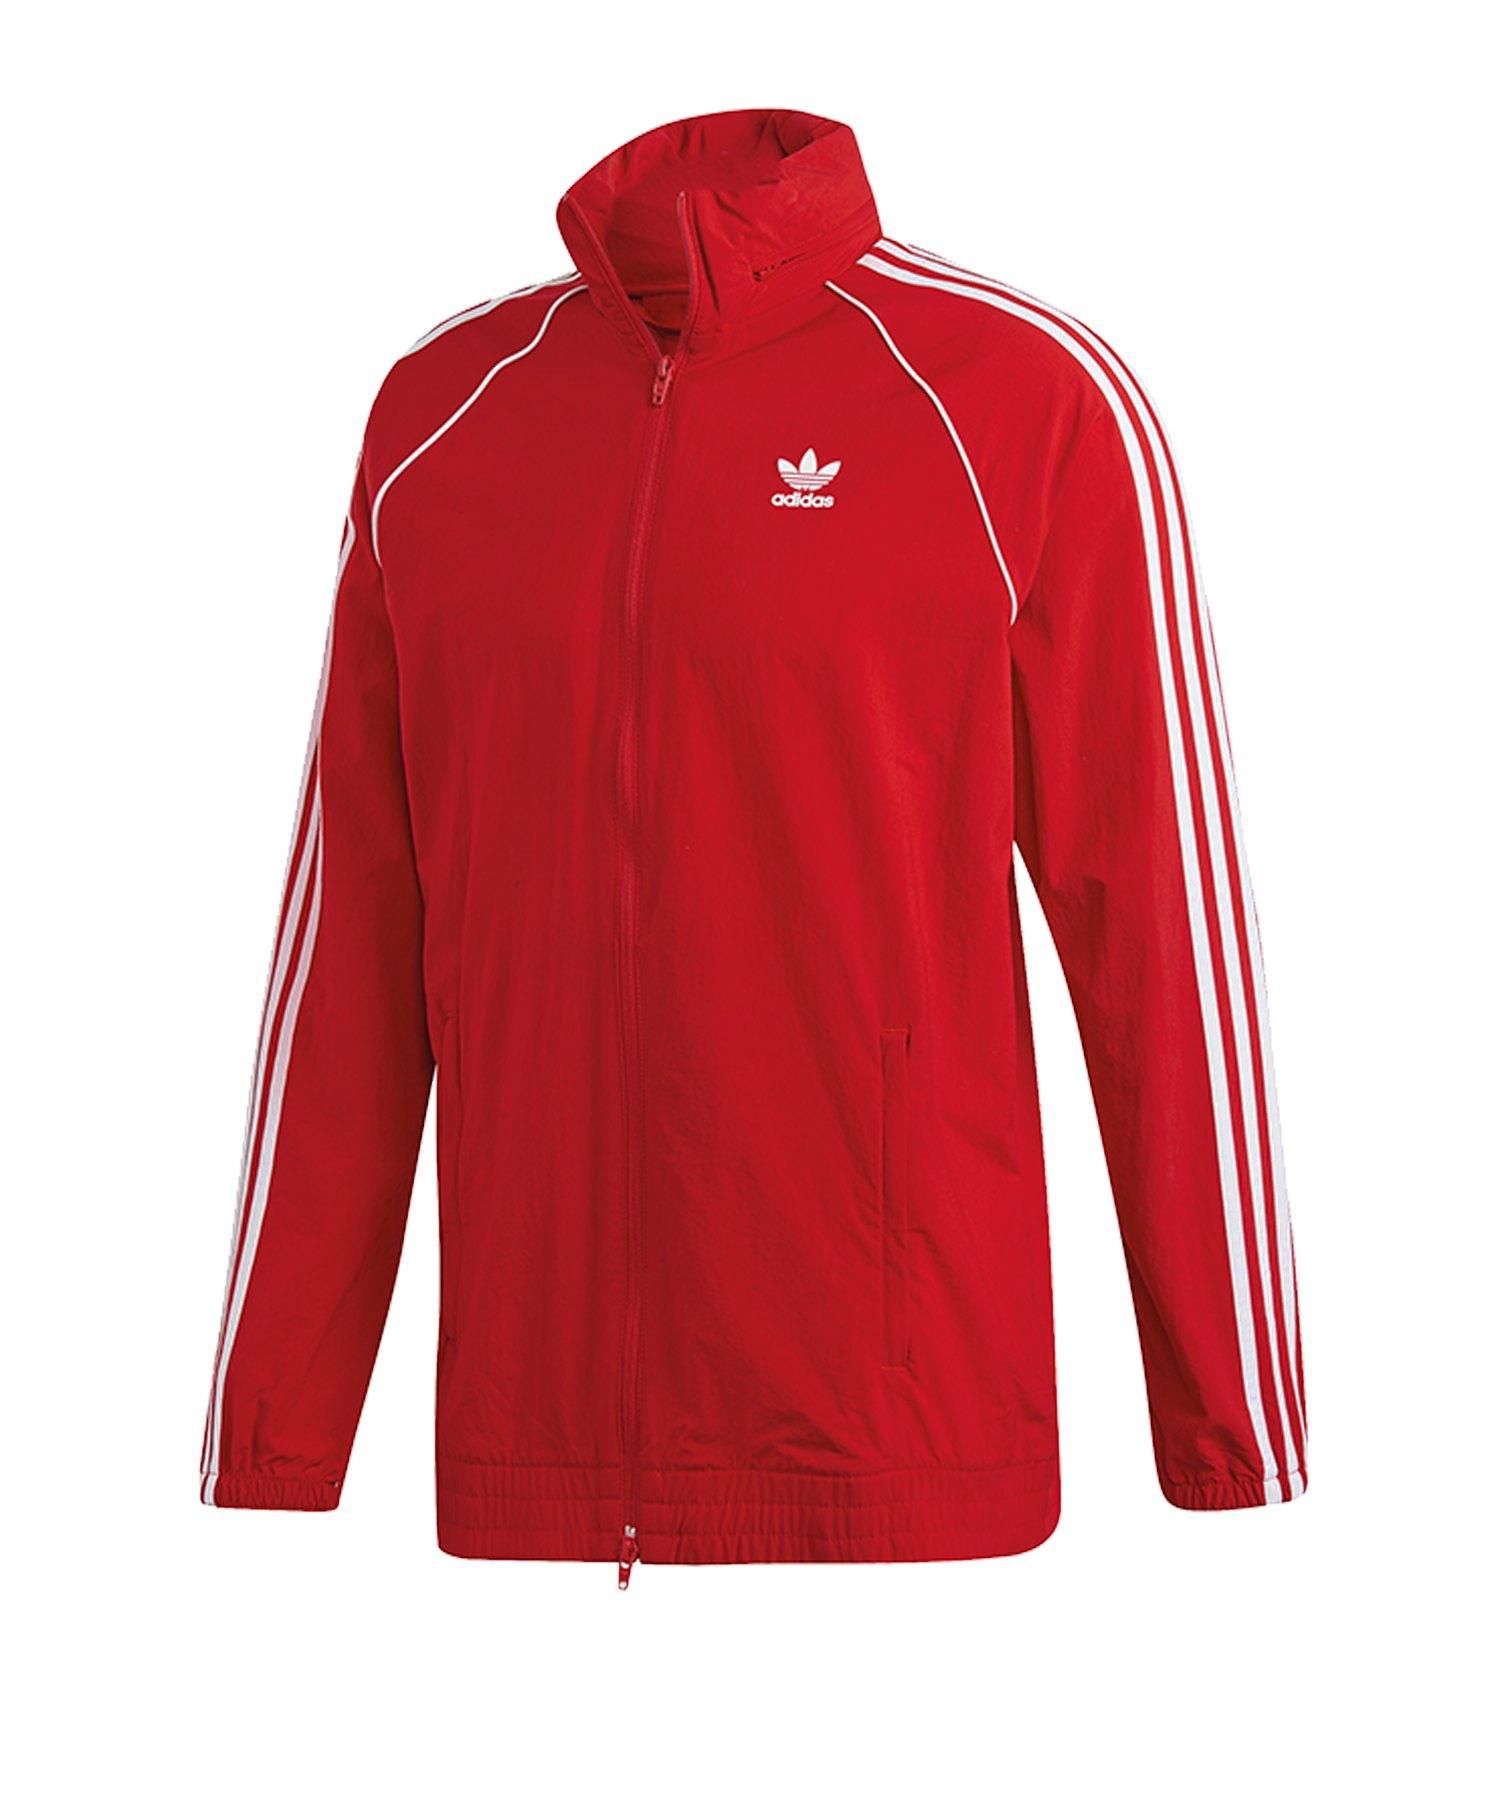 adidas windbreaker rot weiß schwarz